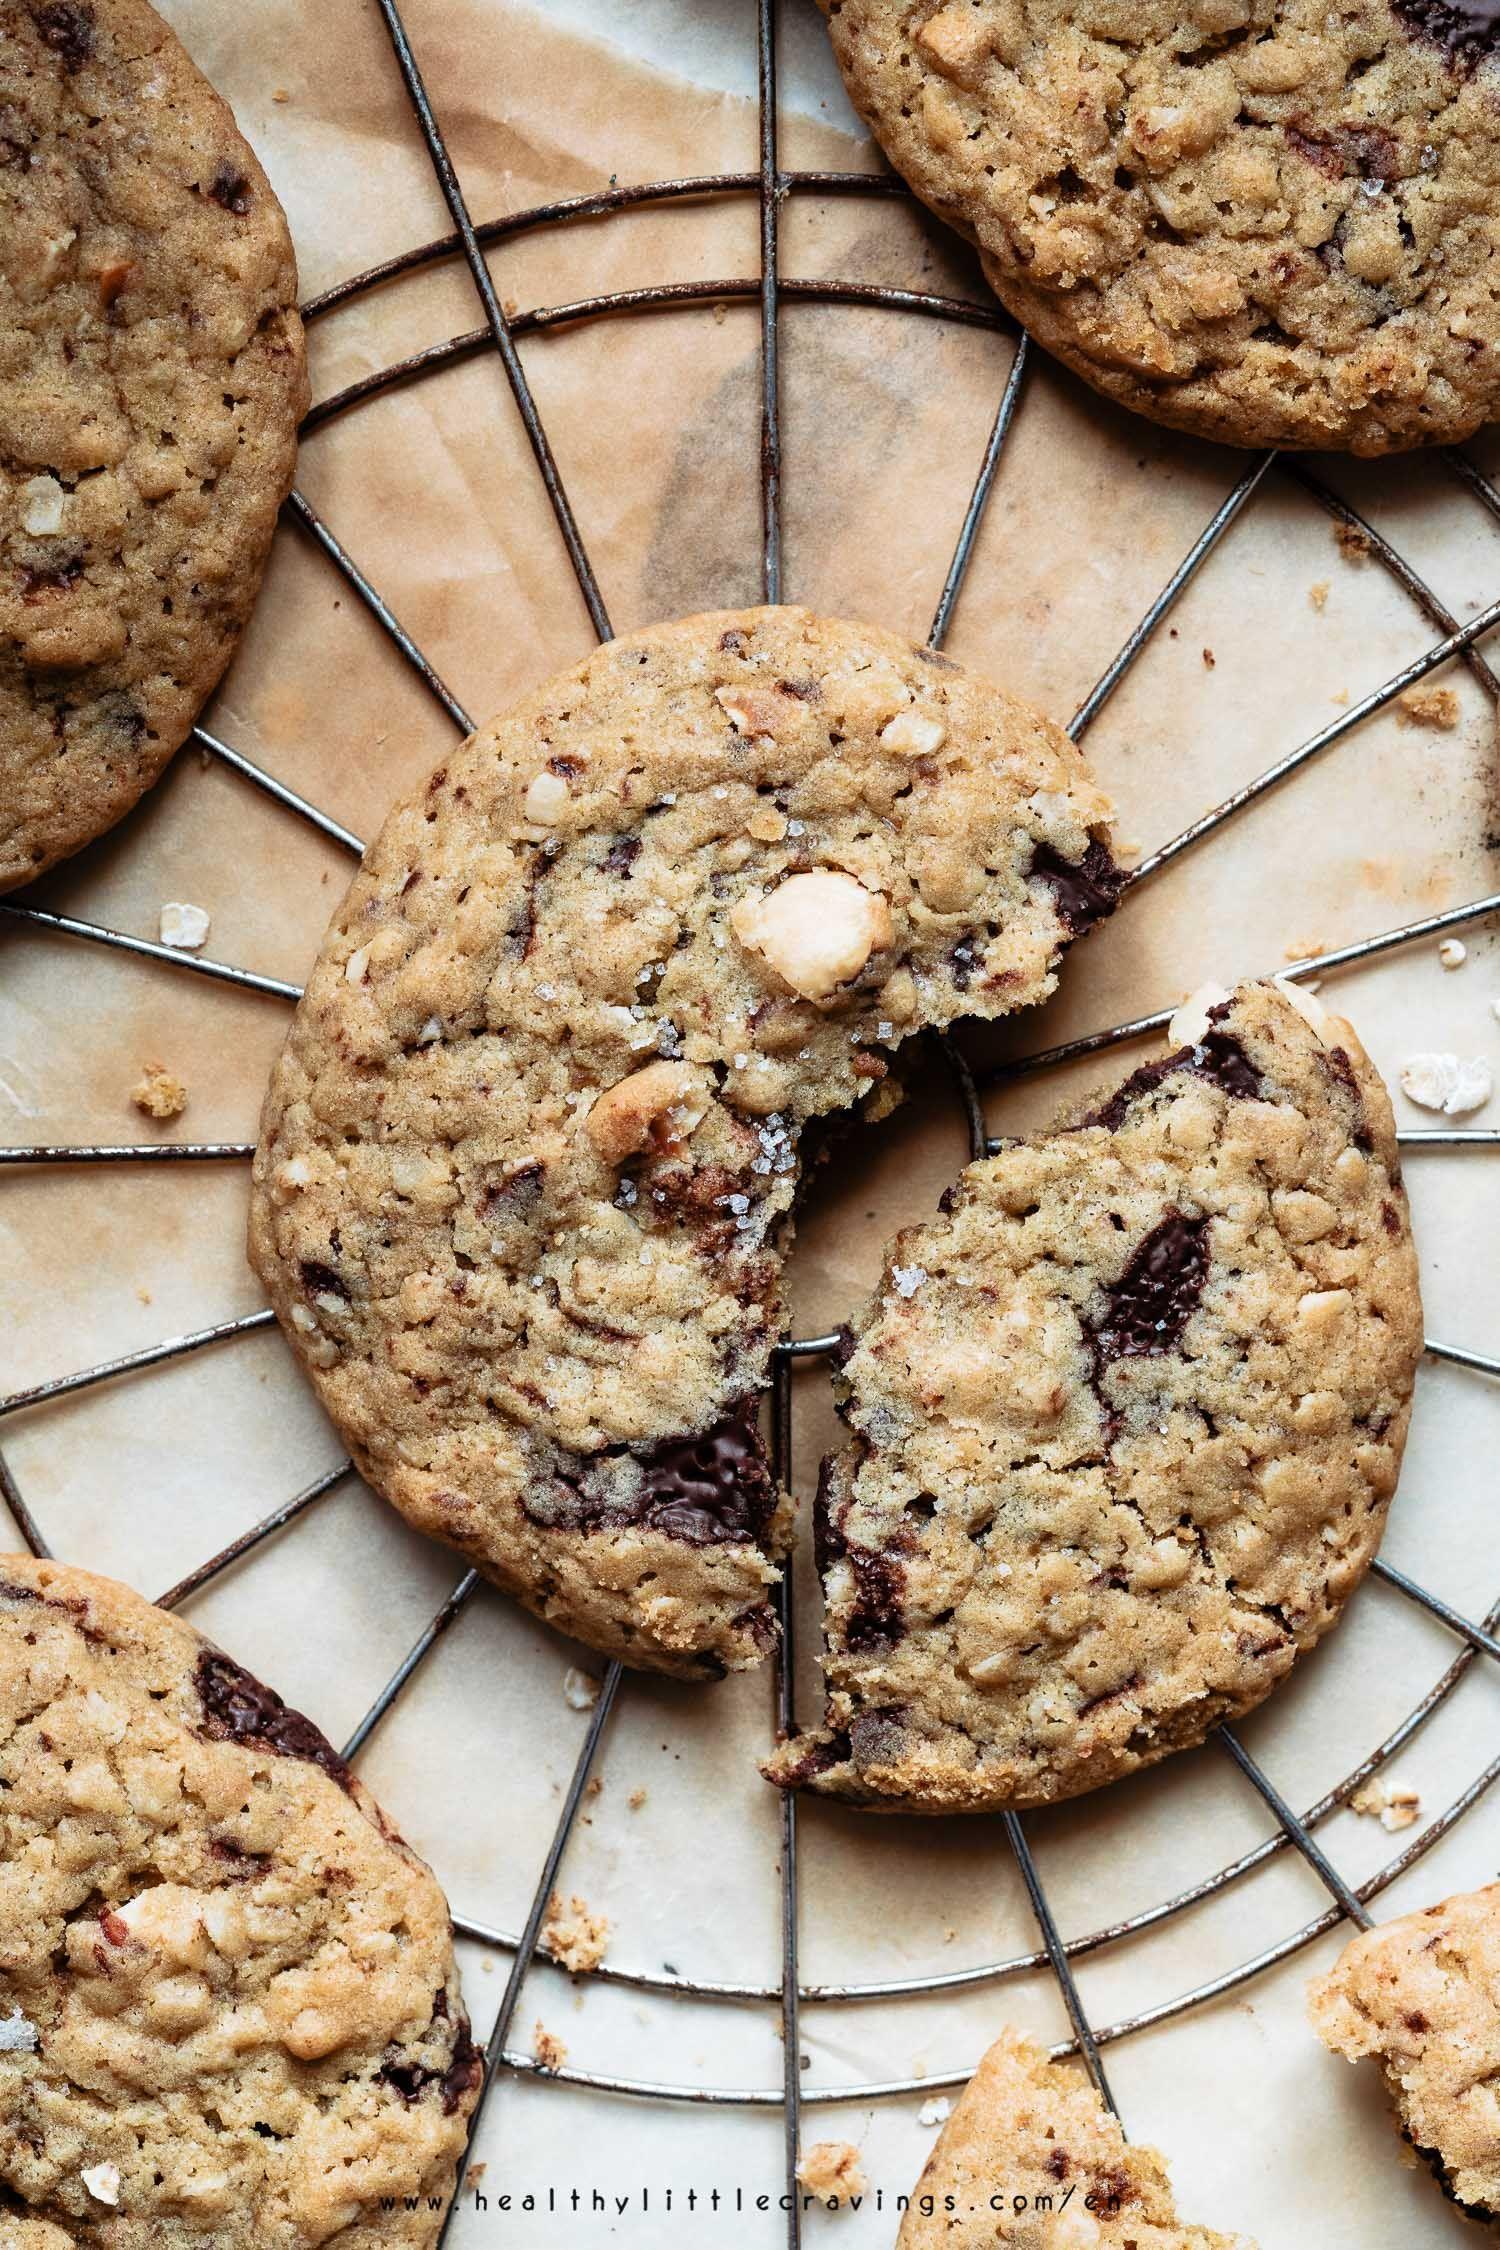 Jumbo Oatmeal Chocolate Chip Cookies Oatmeal Chocolate Chip Cookies Chocolate Chip Oatmeal Cookies Recipes Chocolate Chip